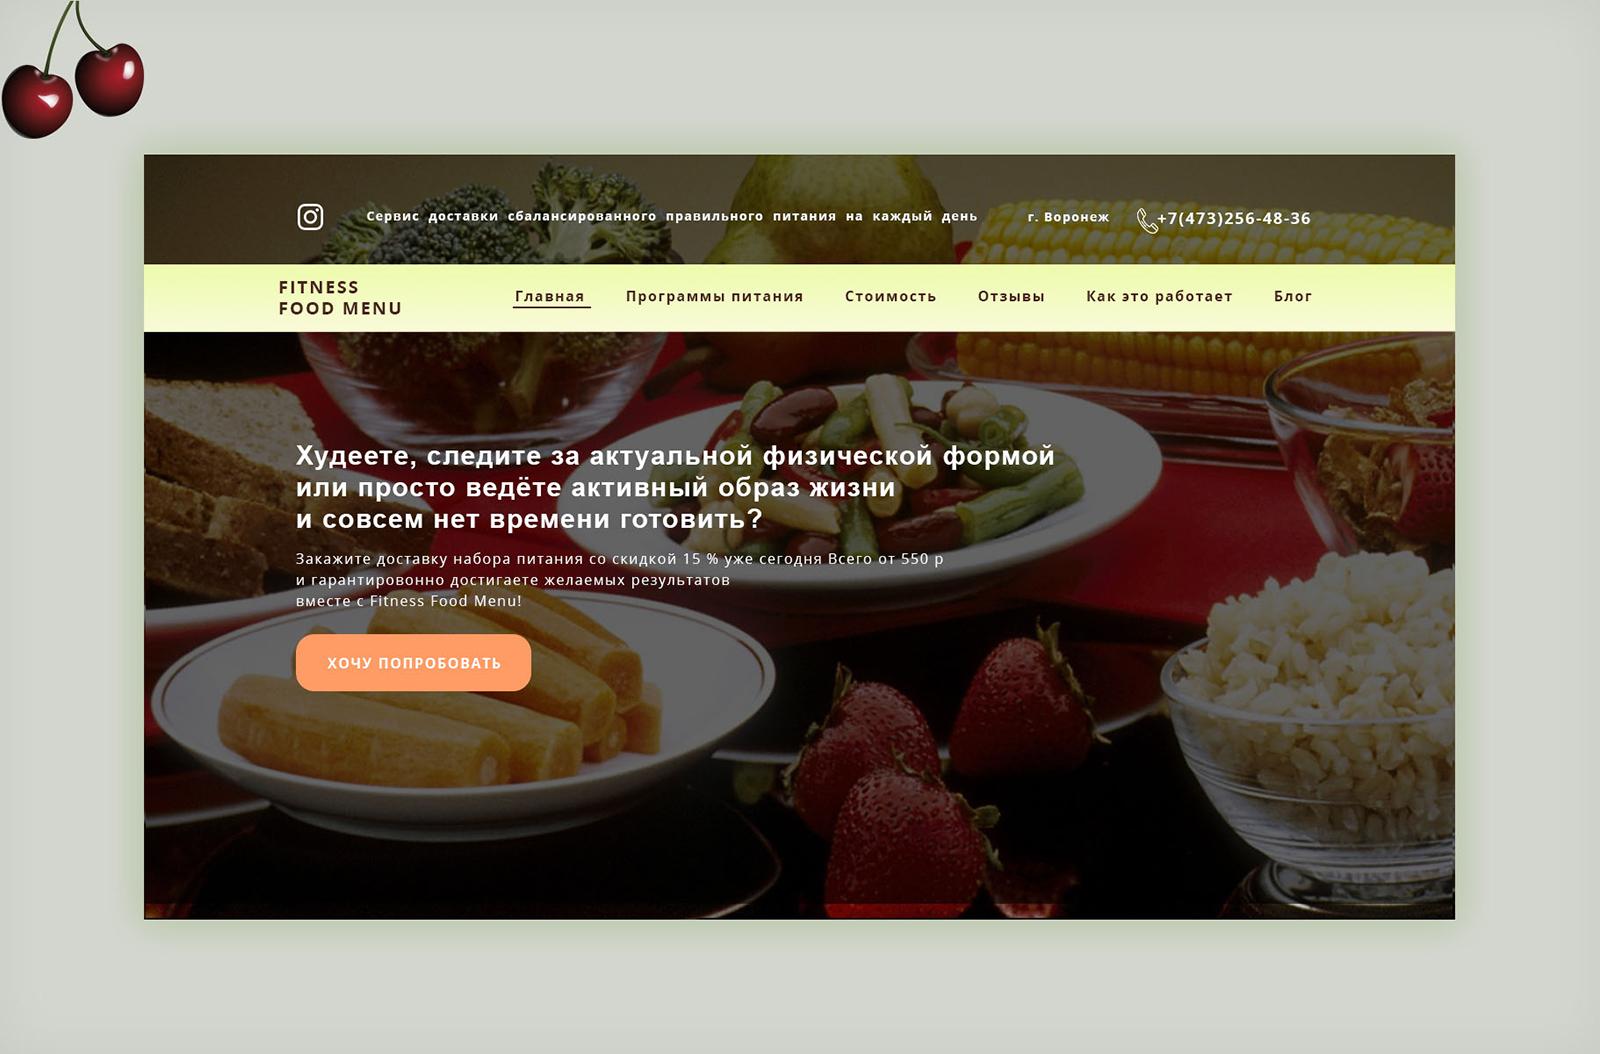 Fitness food menu